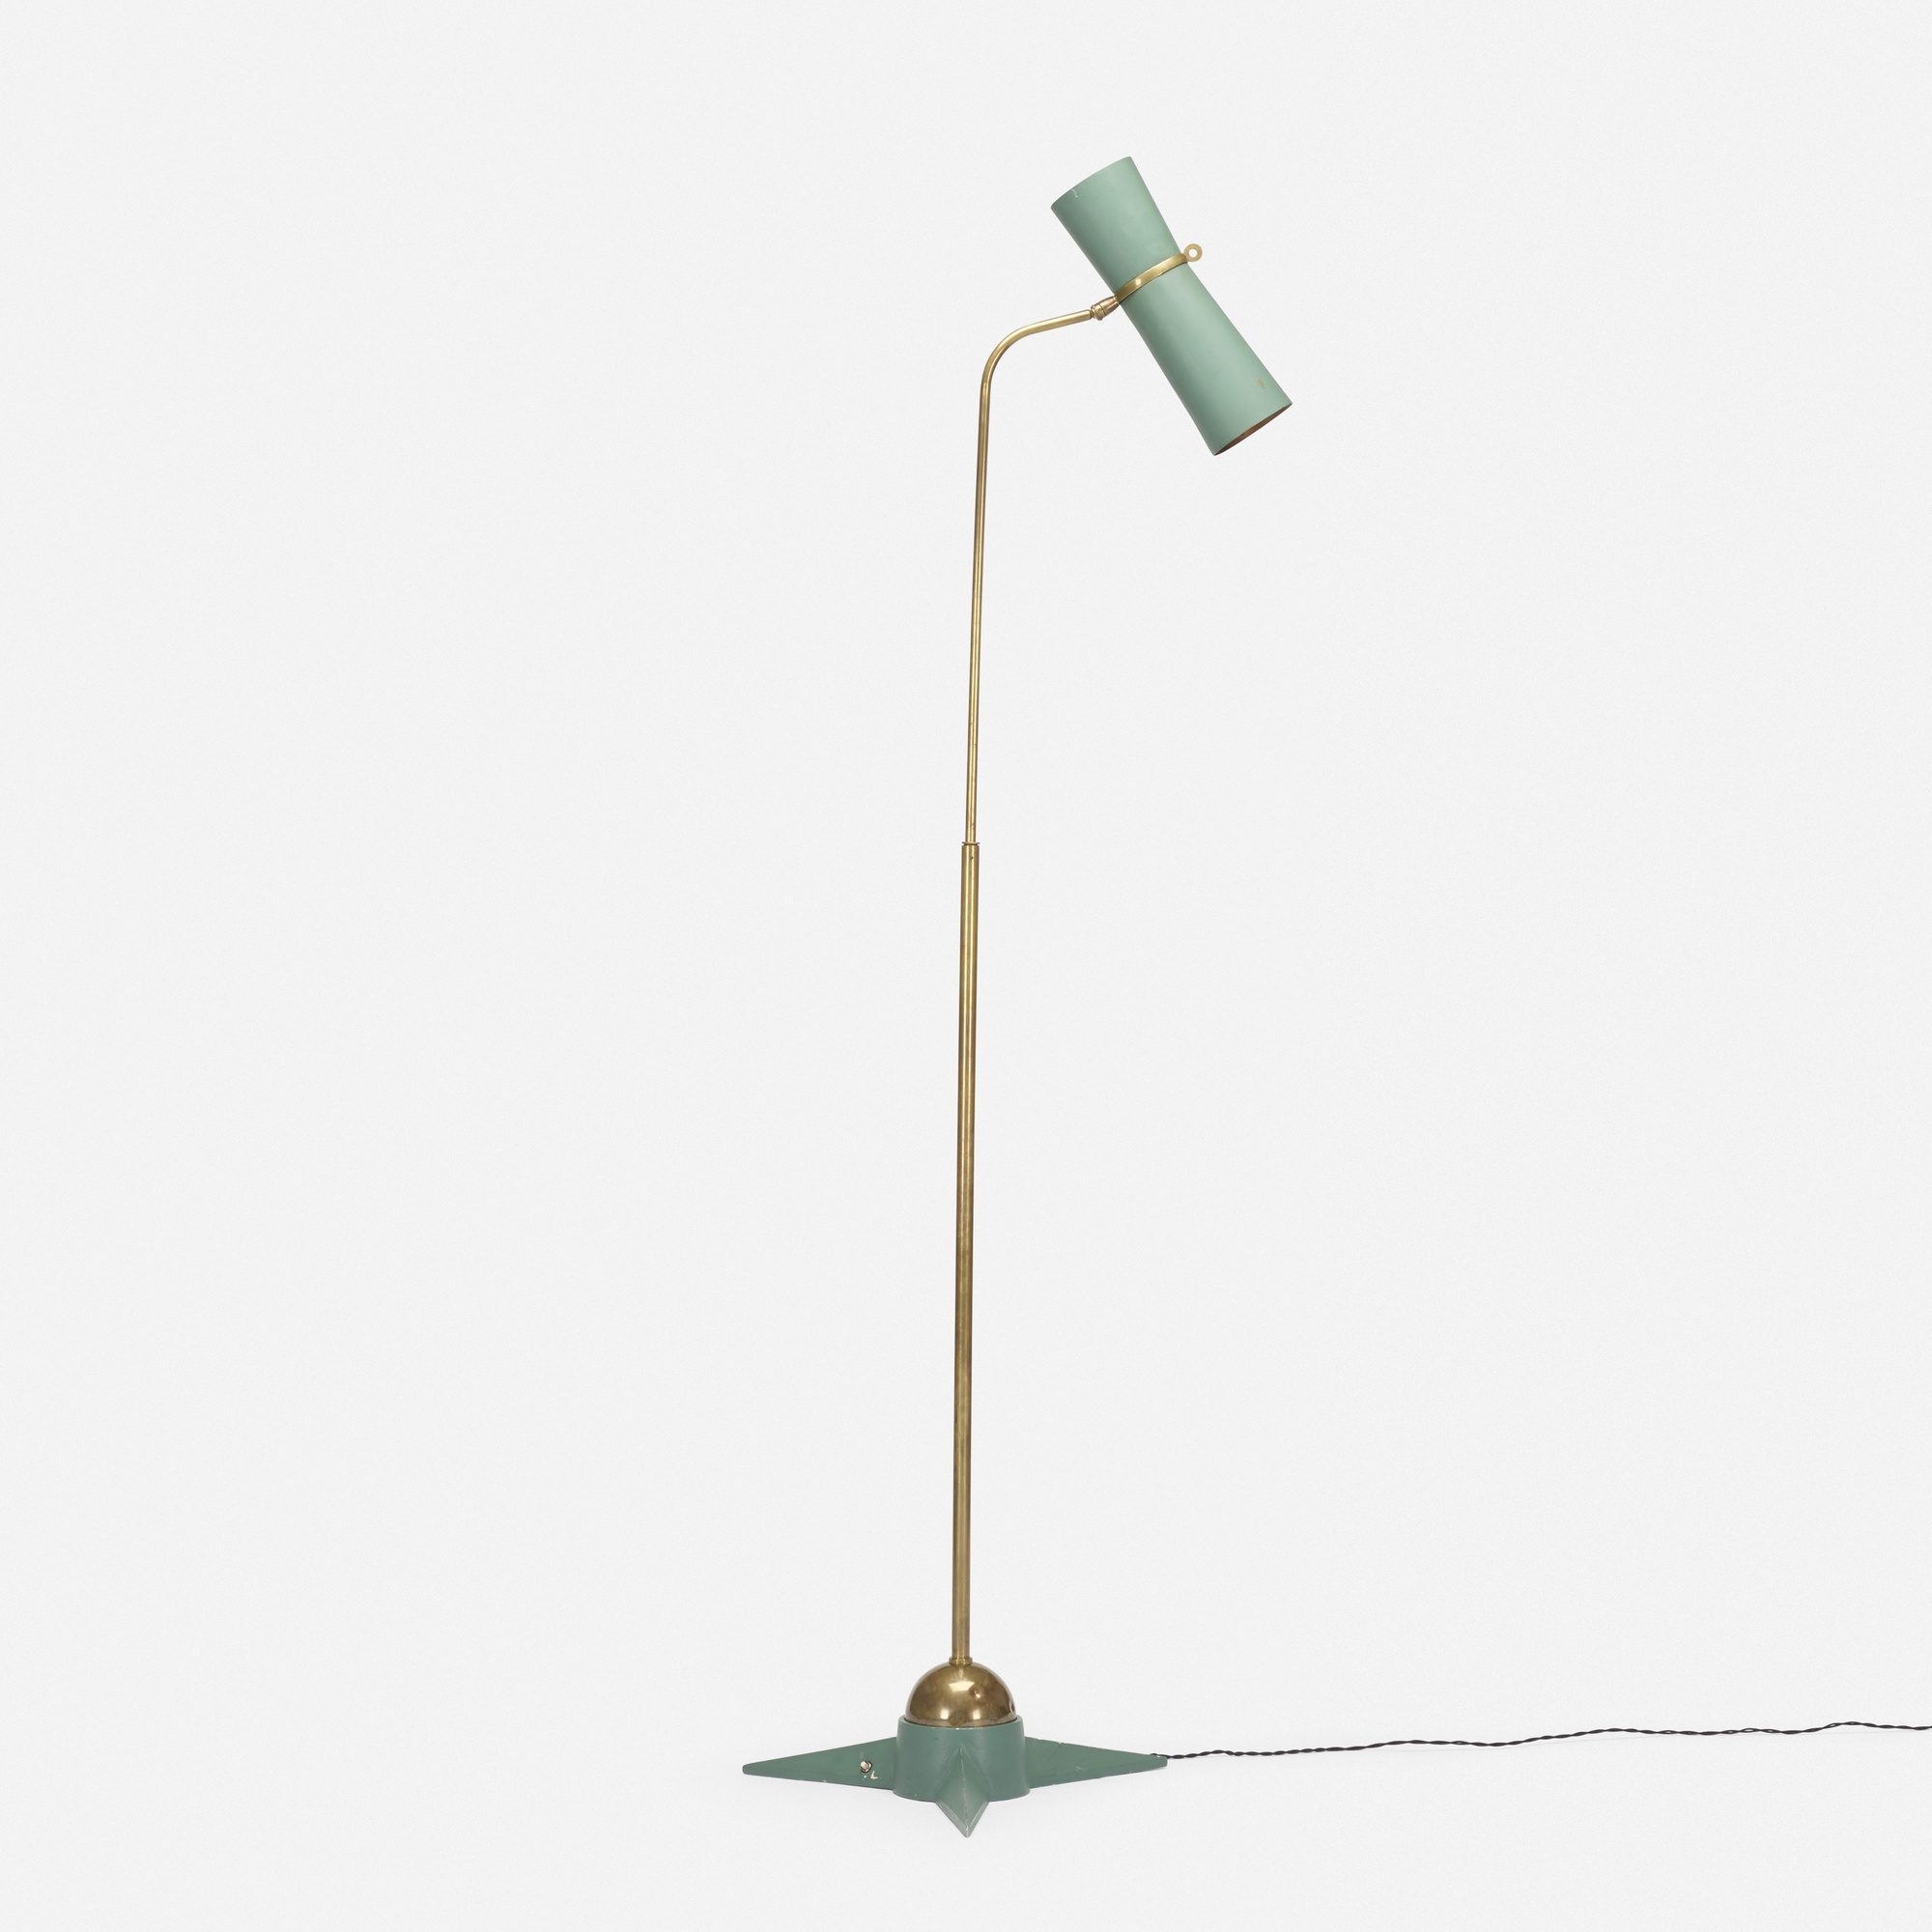 122: Robert Mathieu / floor lamp (1 of 4)